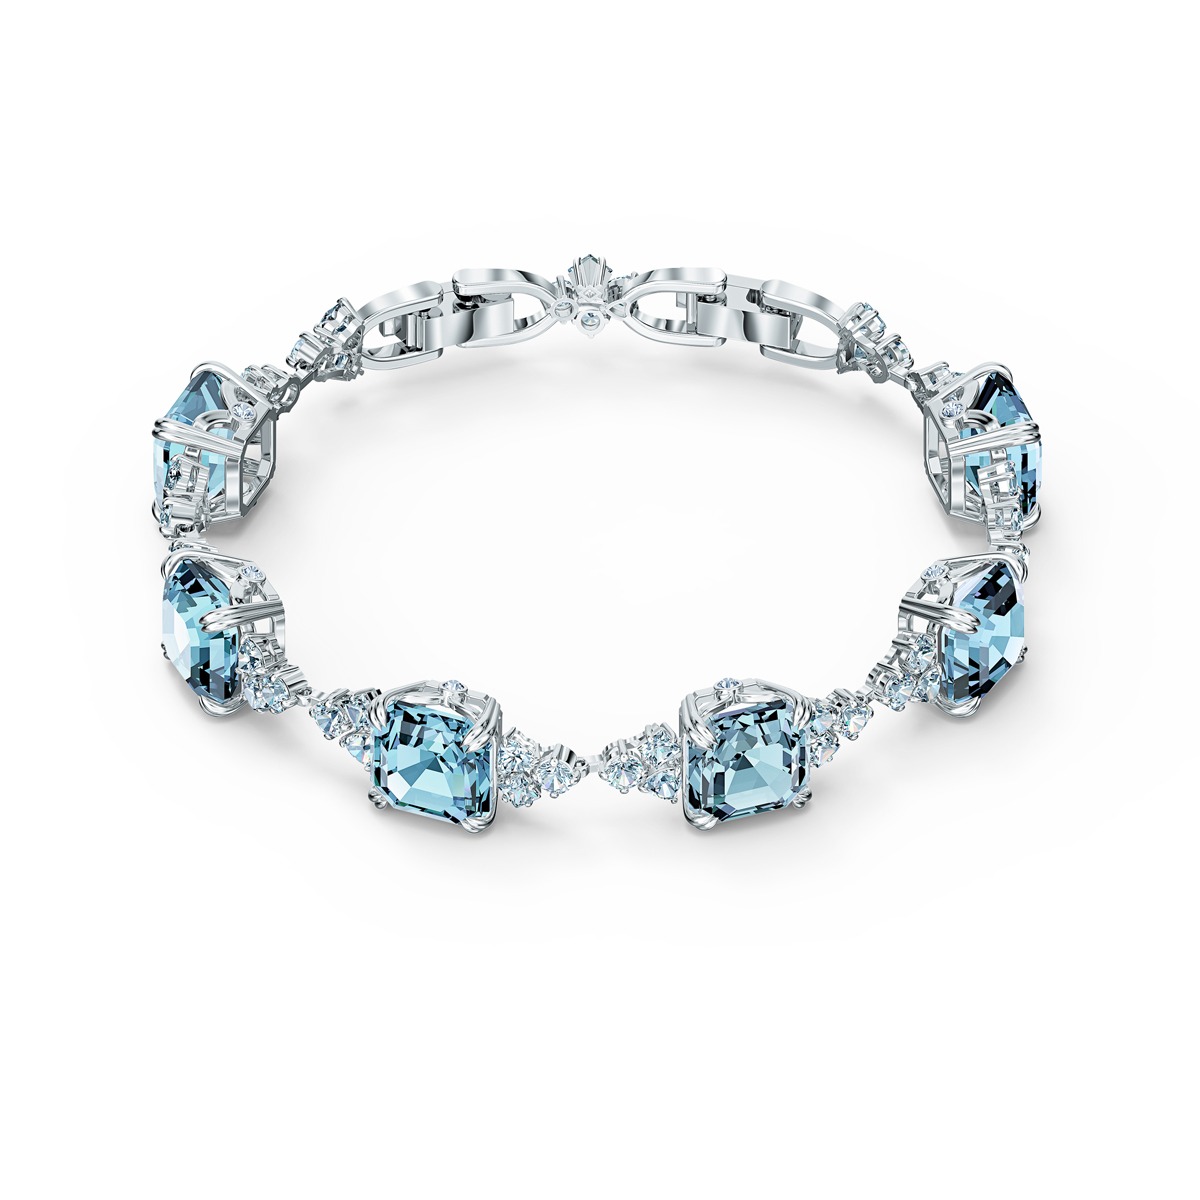 Swarovski Bracelet Sparkling Aqua Rhodium Silver M